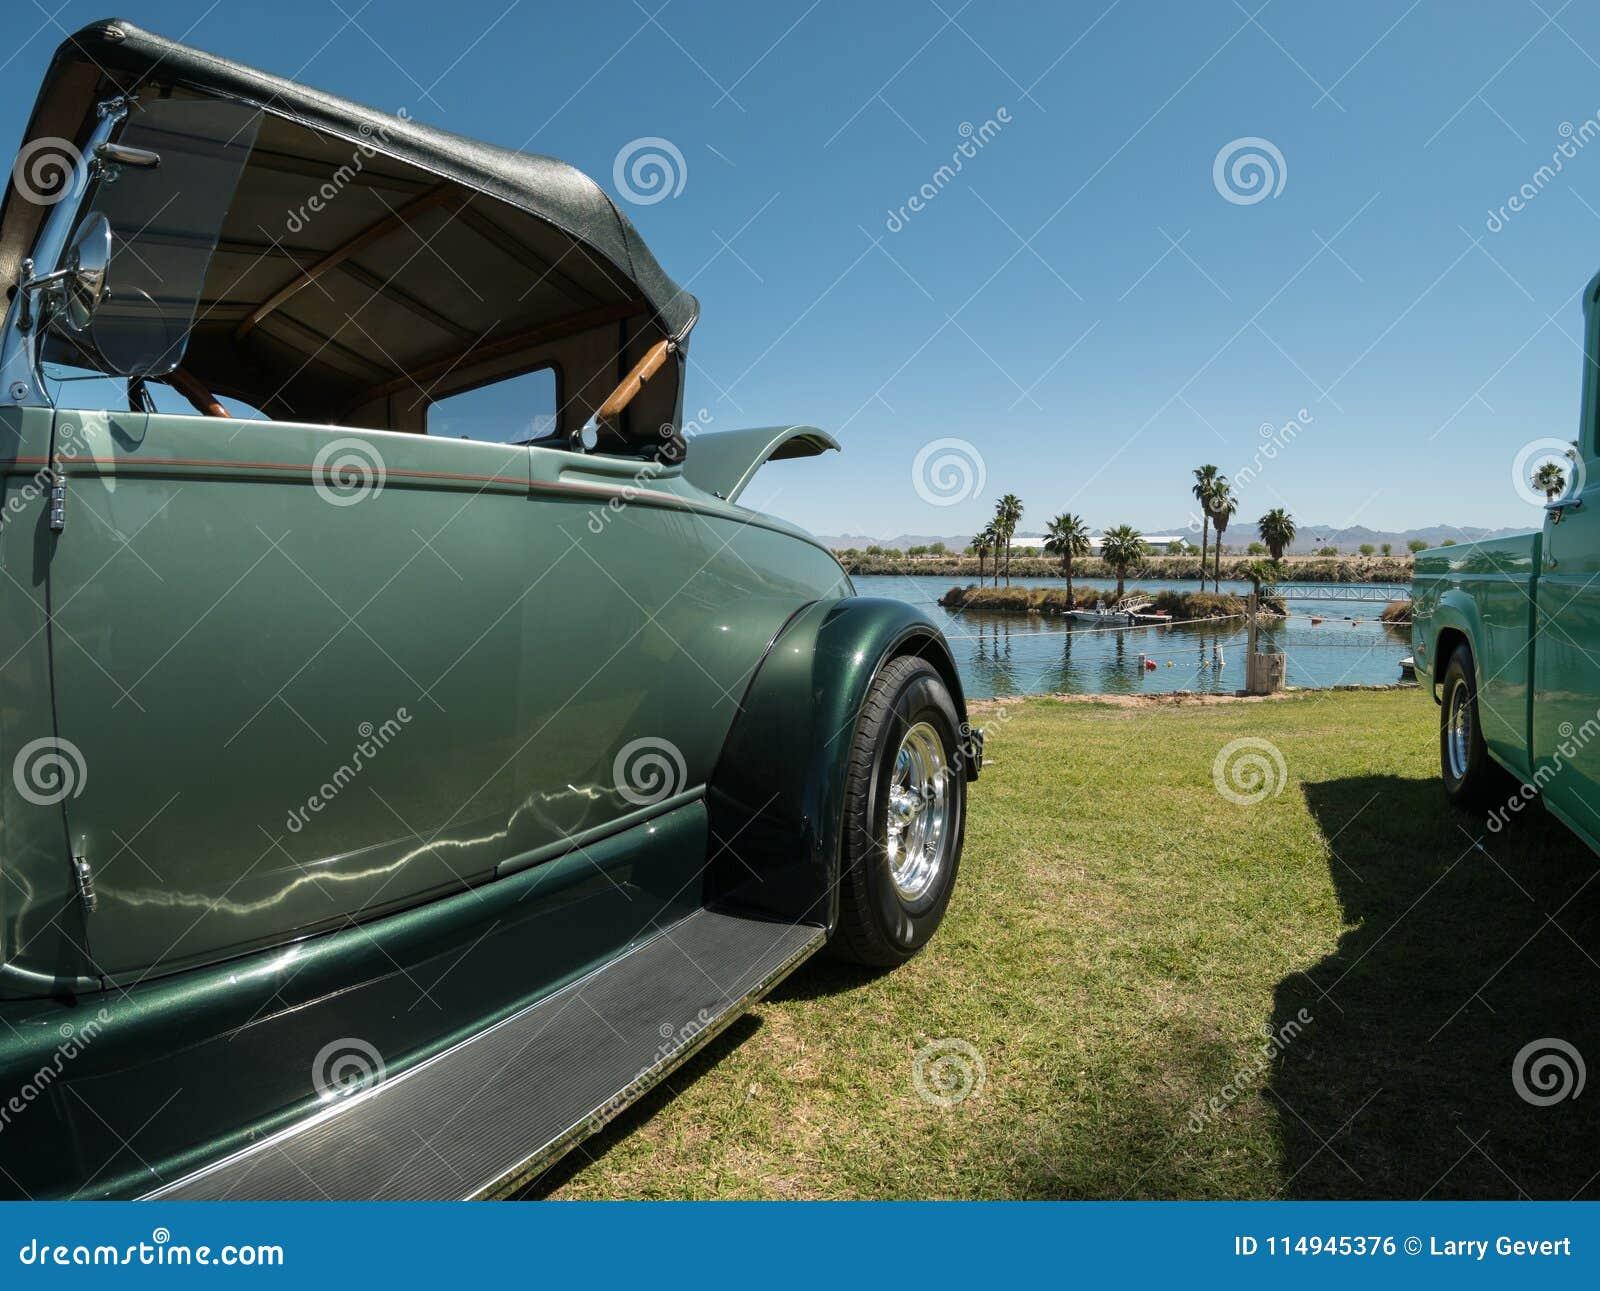 Classic Car Show And Shine Stock Photo Image Of Laughlin - Laughlin car show